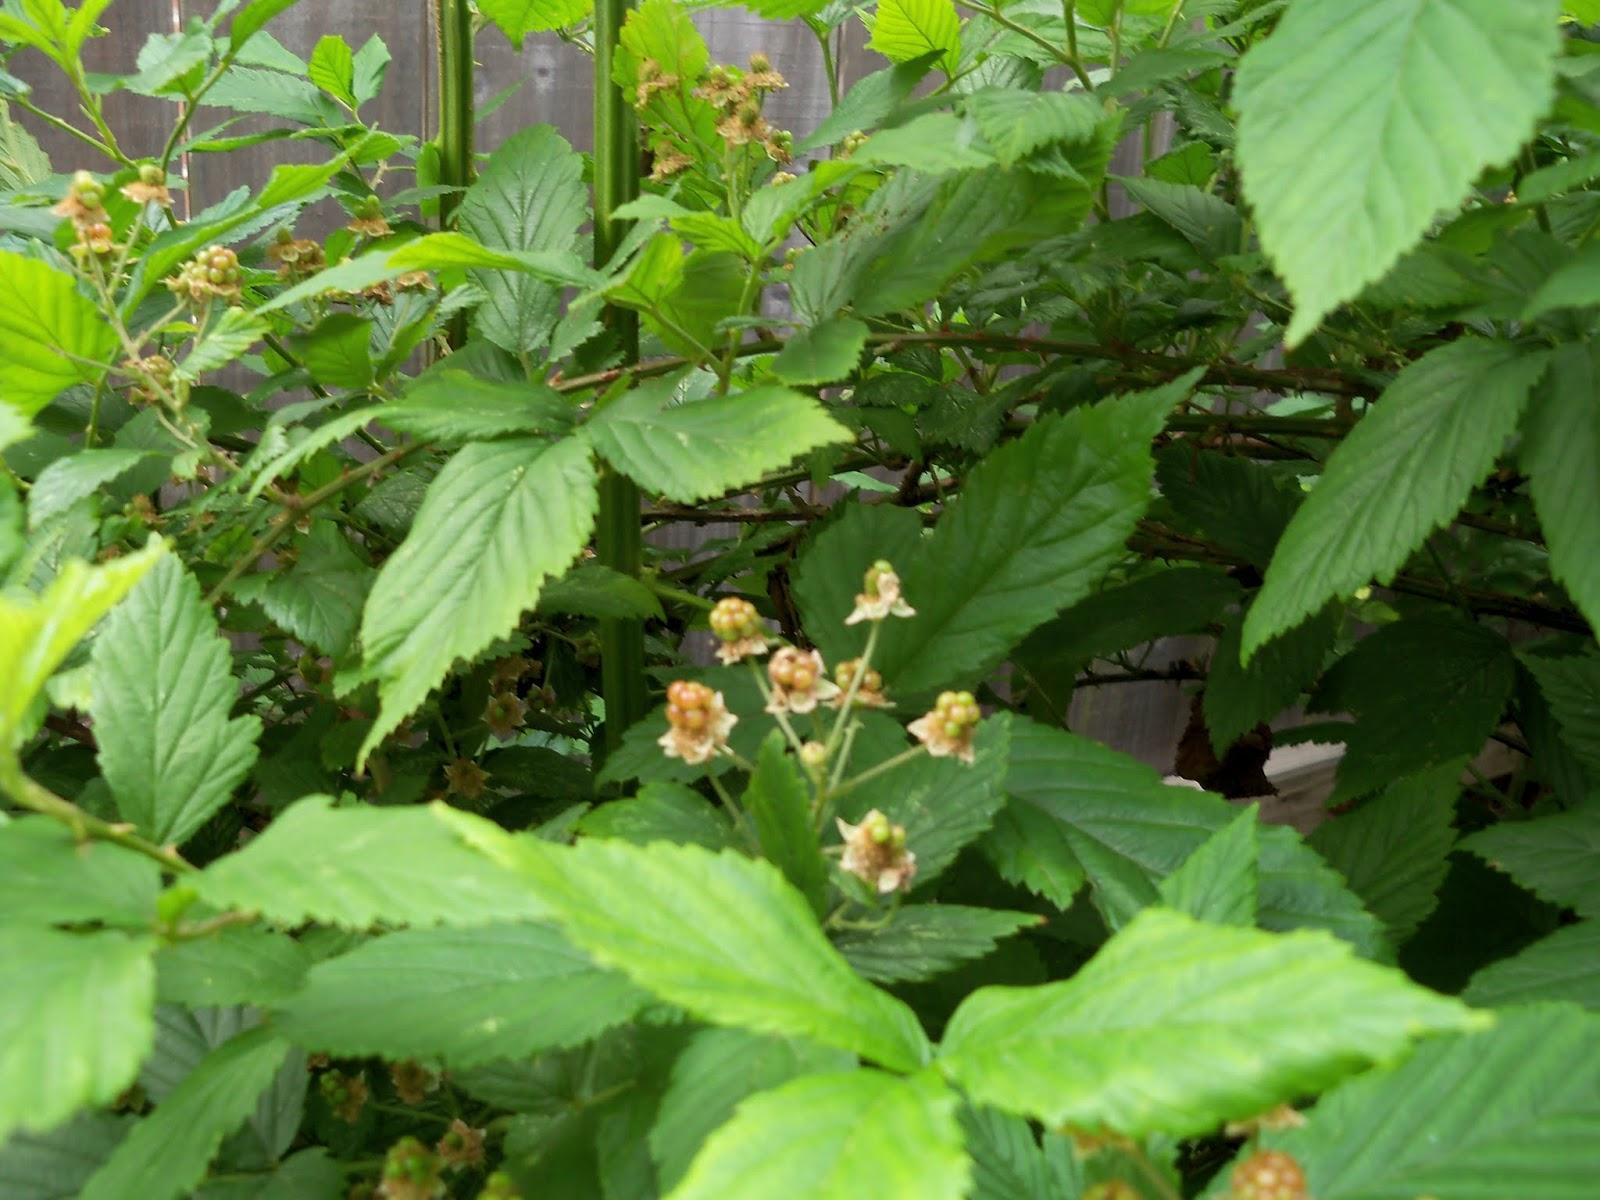 Gardening 2013 - 115_6079.JPG